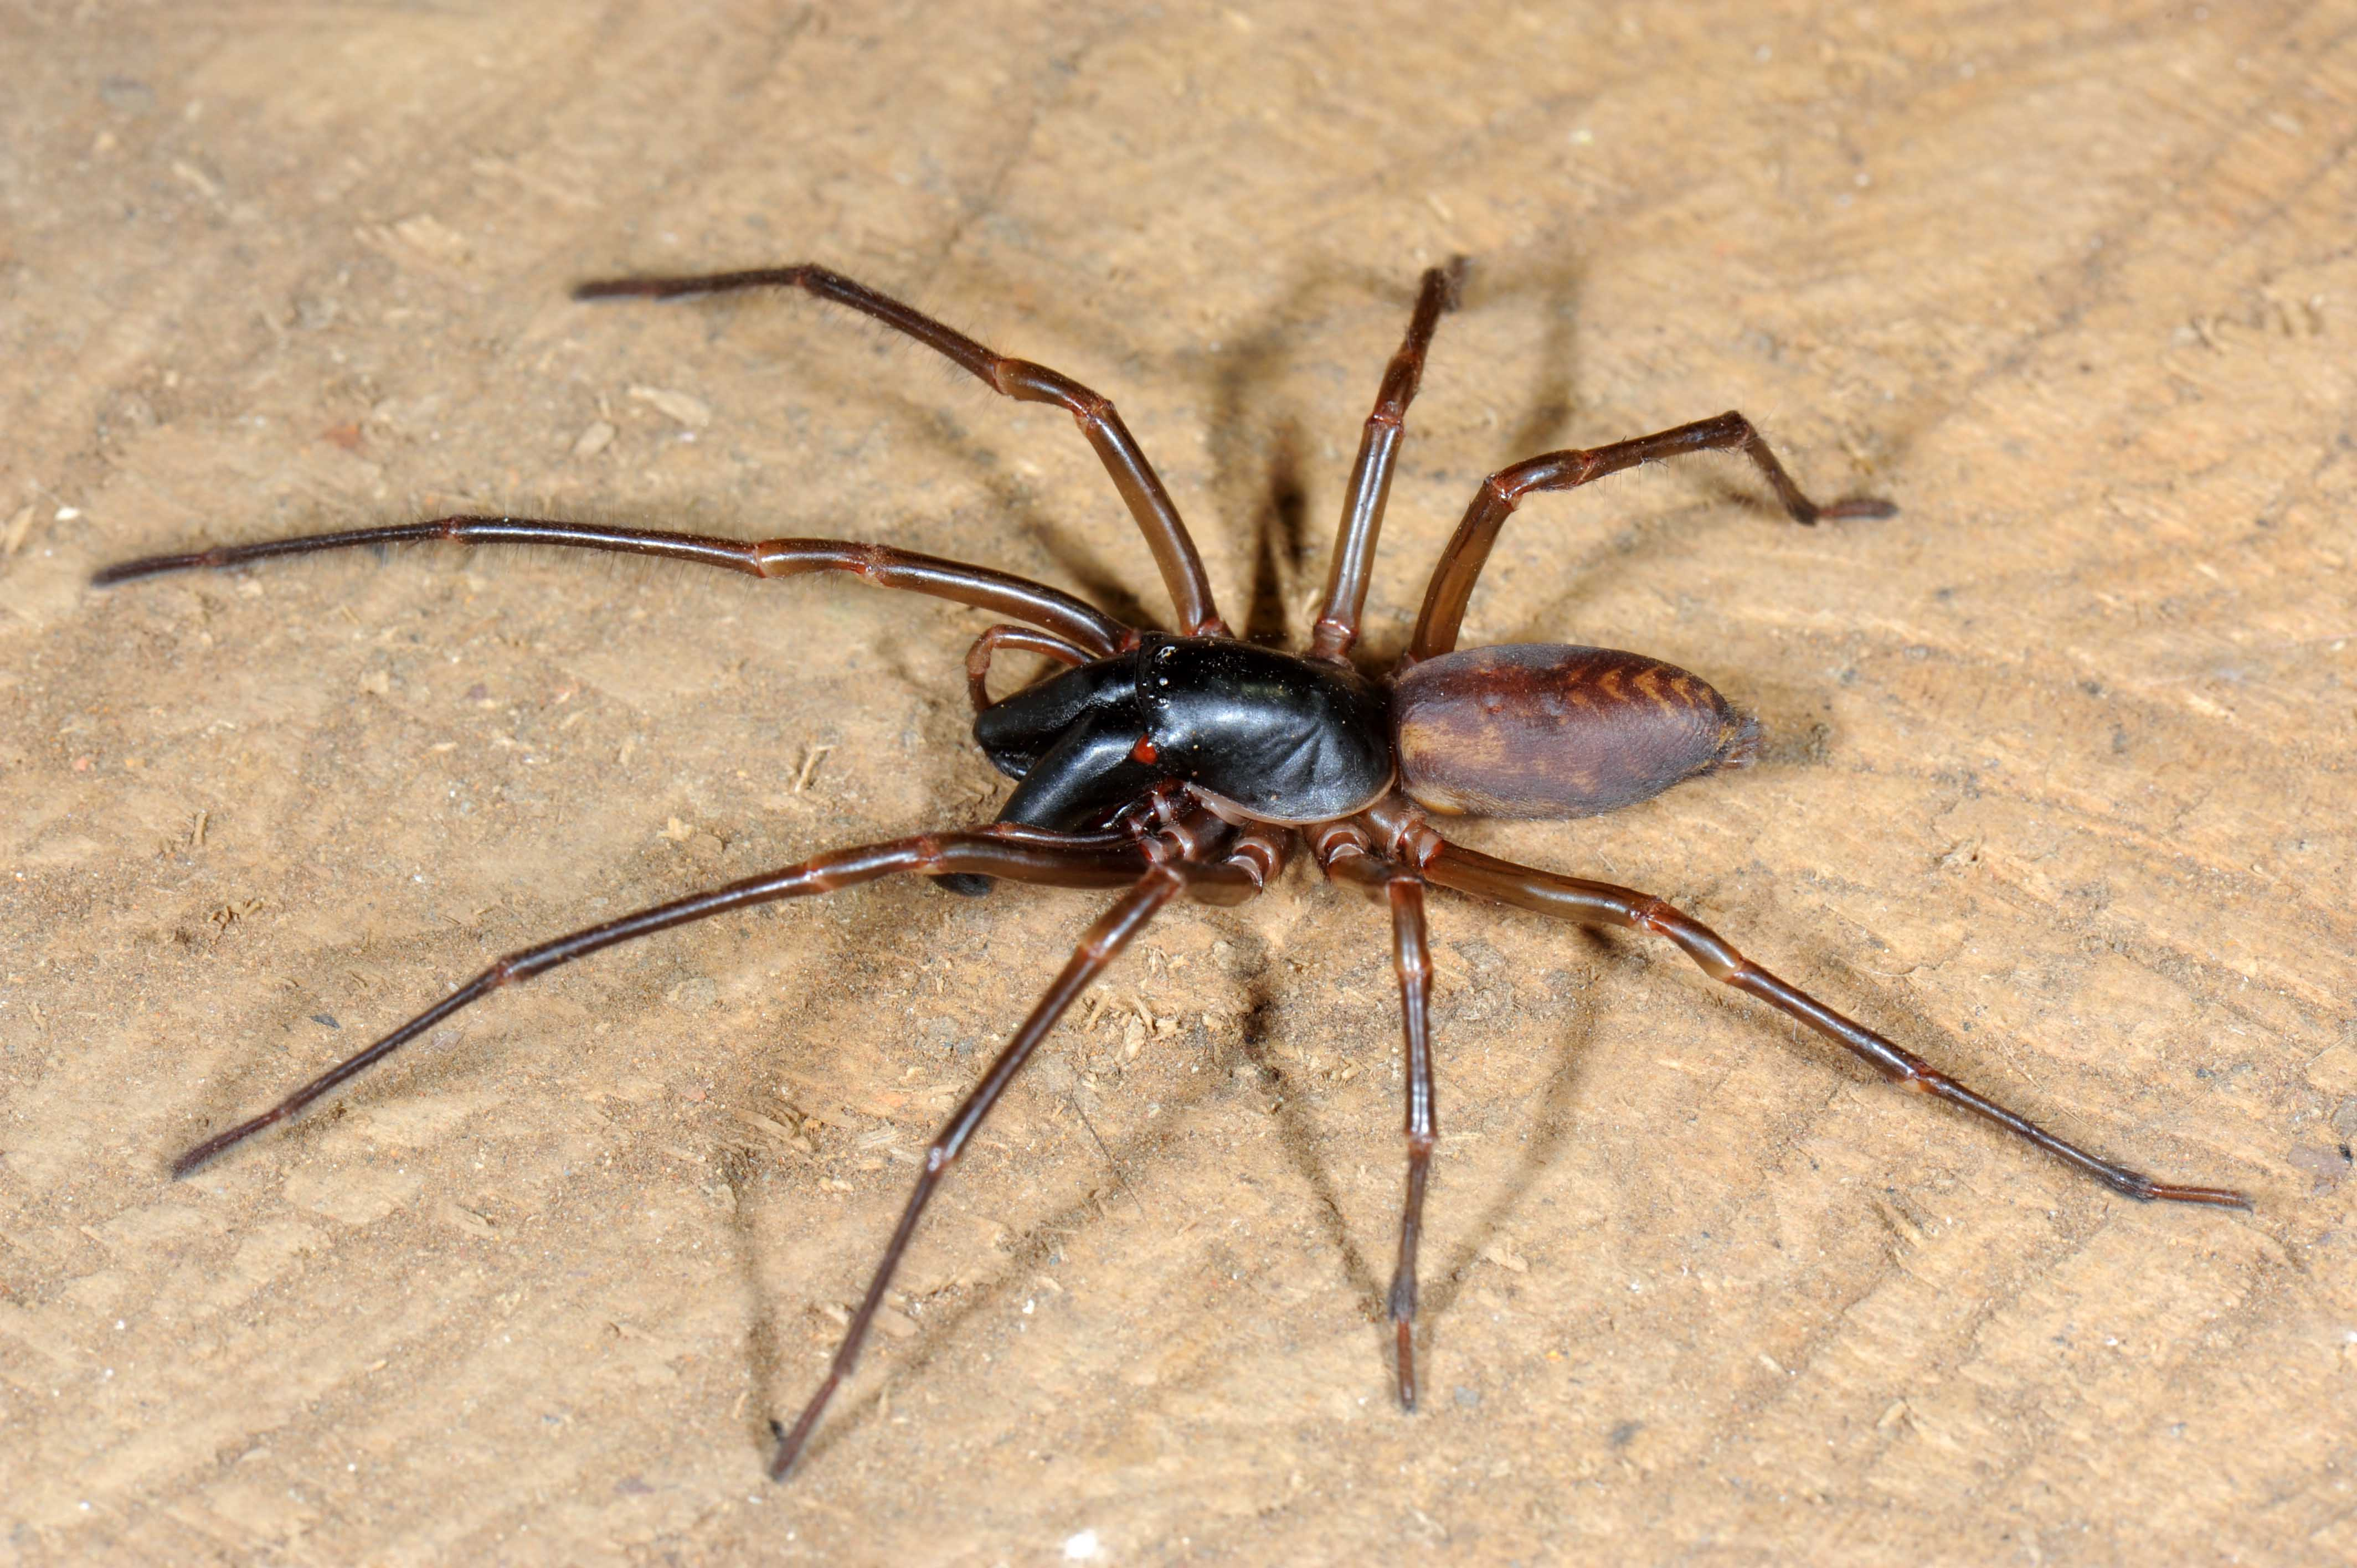 Castaway Ghost Spiders Flew to Robinson Crusoe Island